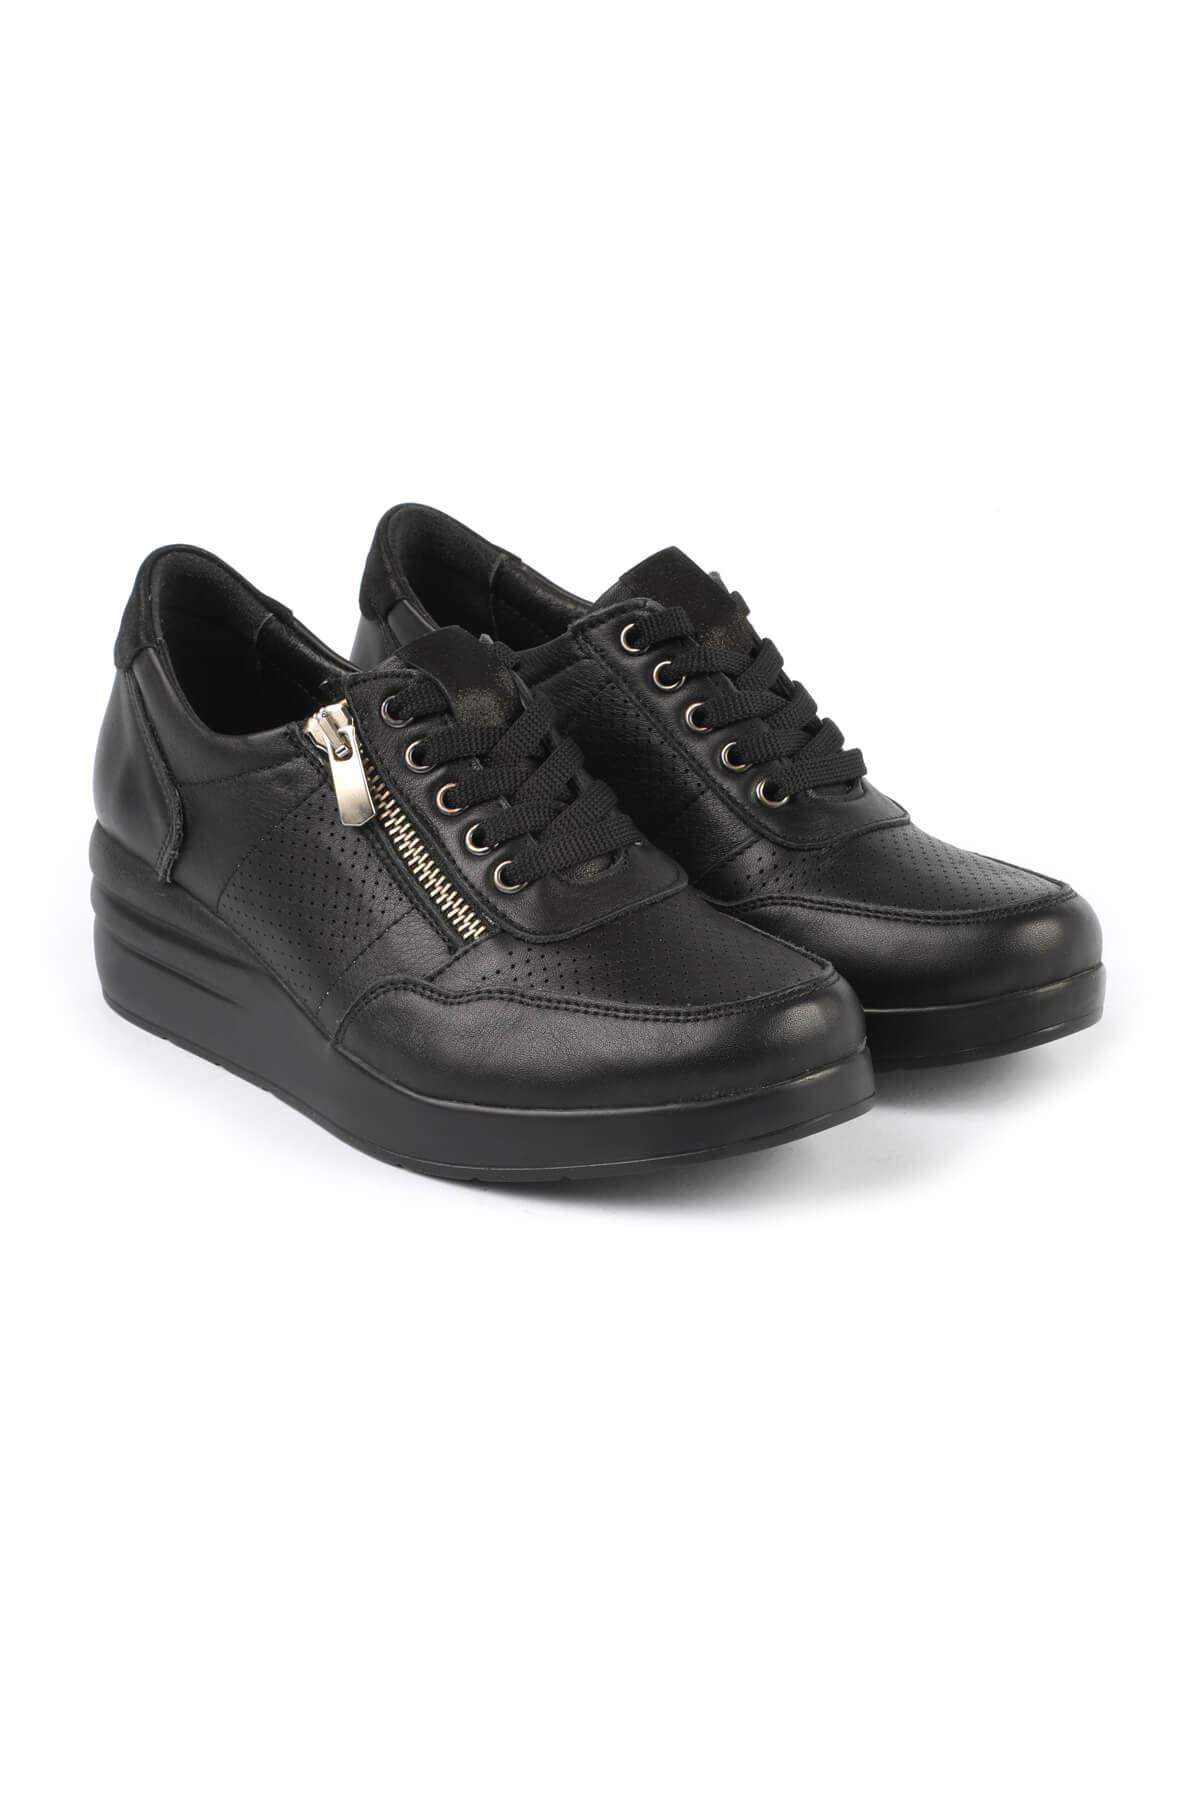 Libero FMS218 Black Casual Shoes